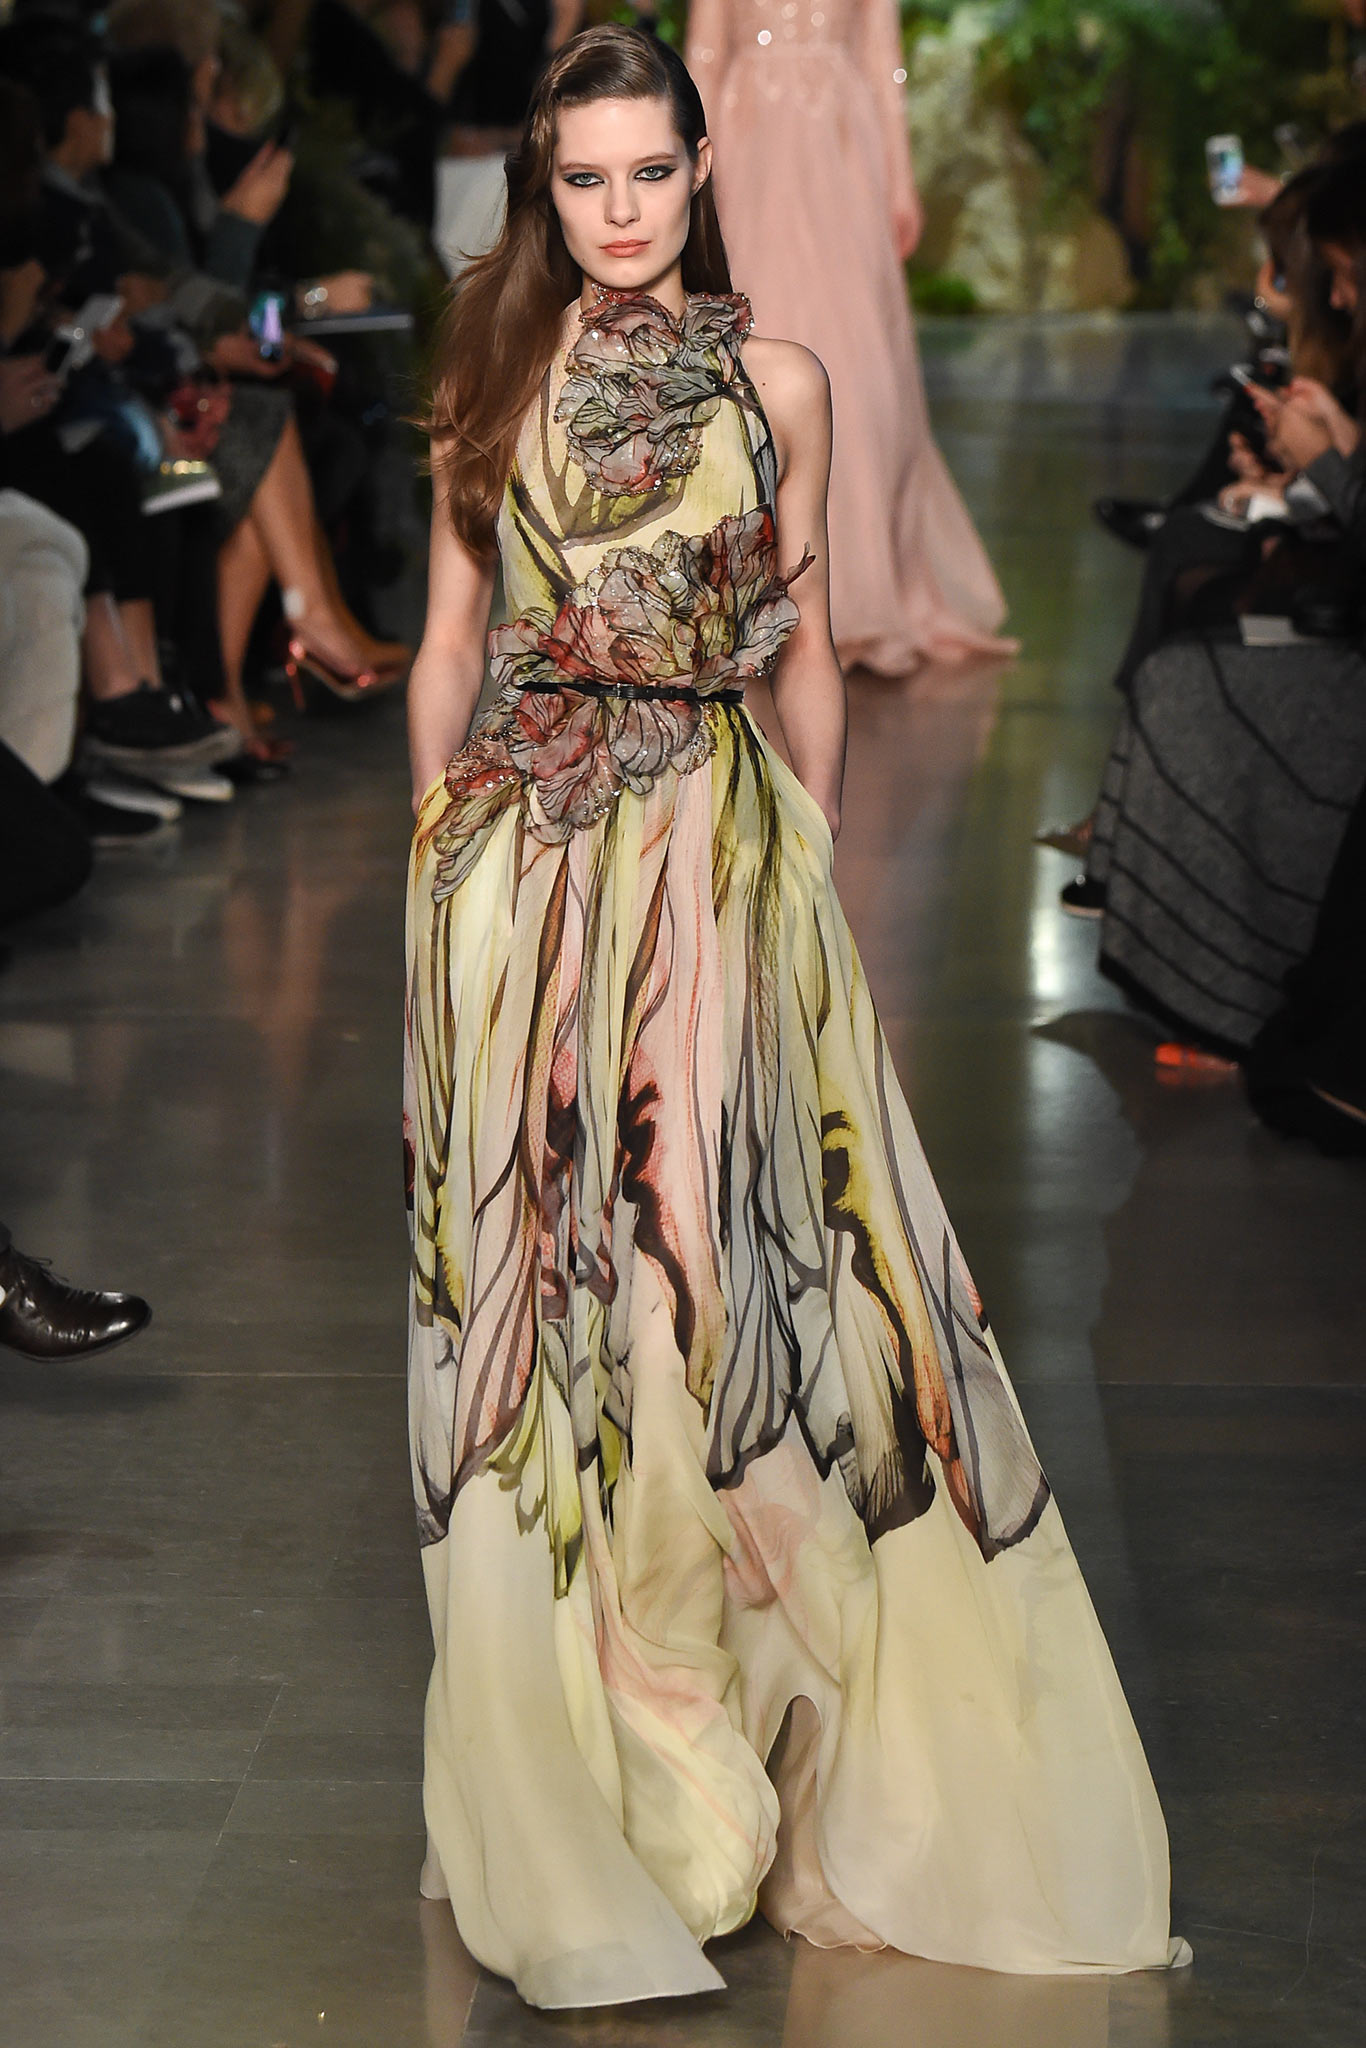 Elie Saab Haute Couture 2015 Самые носибельные образы с Недели моды haute couture в Париже